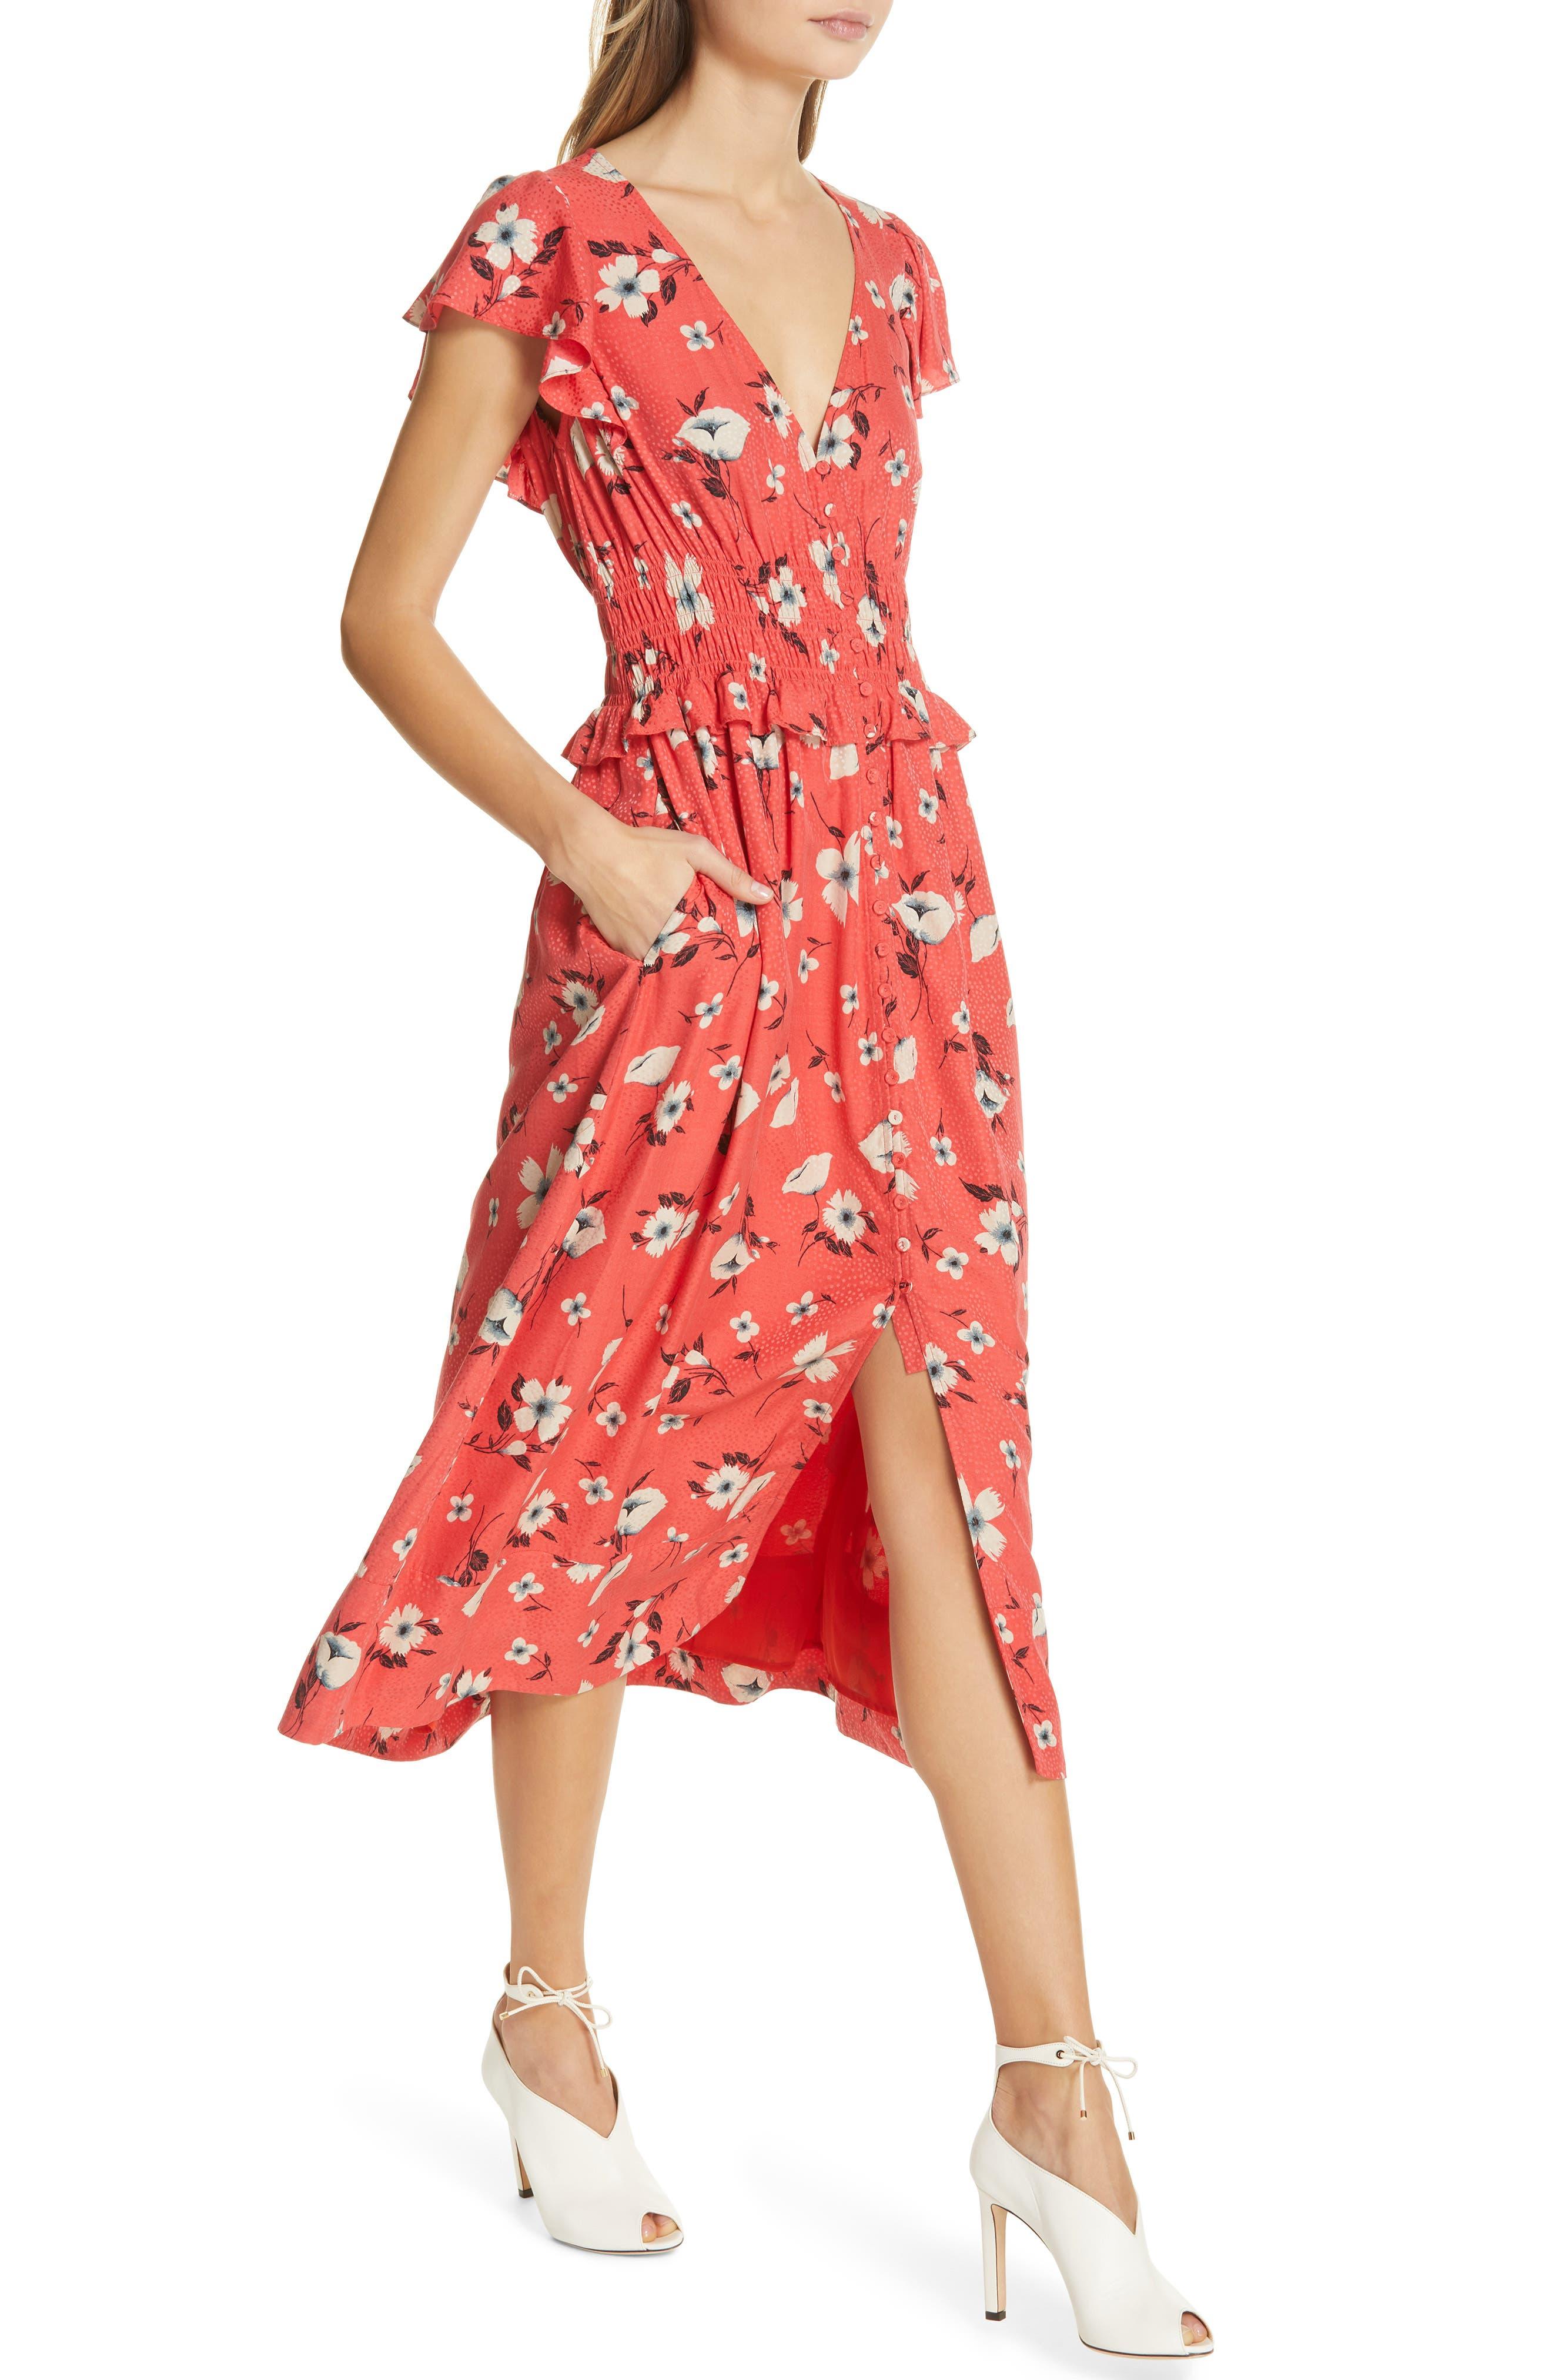 REBECCA TAYLOR, Daniella Floral Jacquard Silk Blend Dress, Alternate thumbnail 5, color, PUNCH COMBO